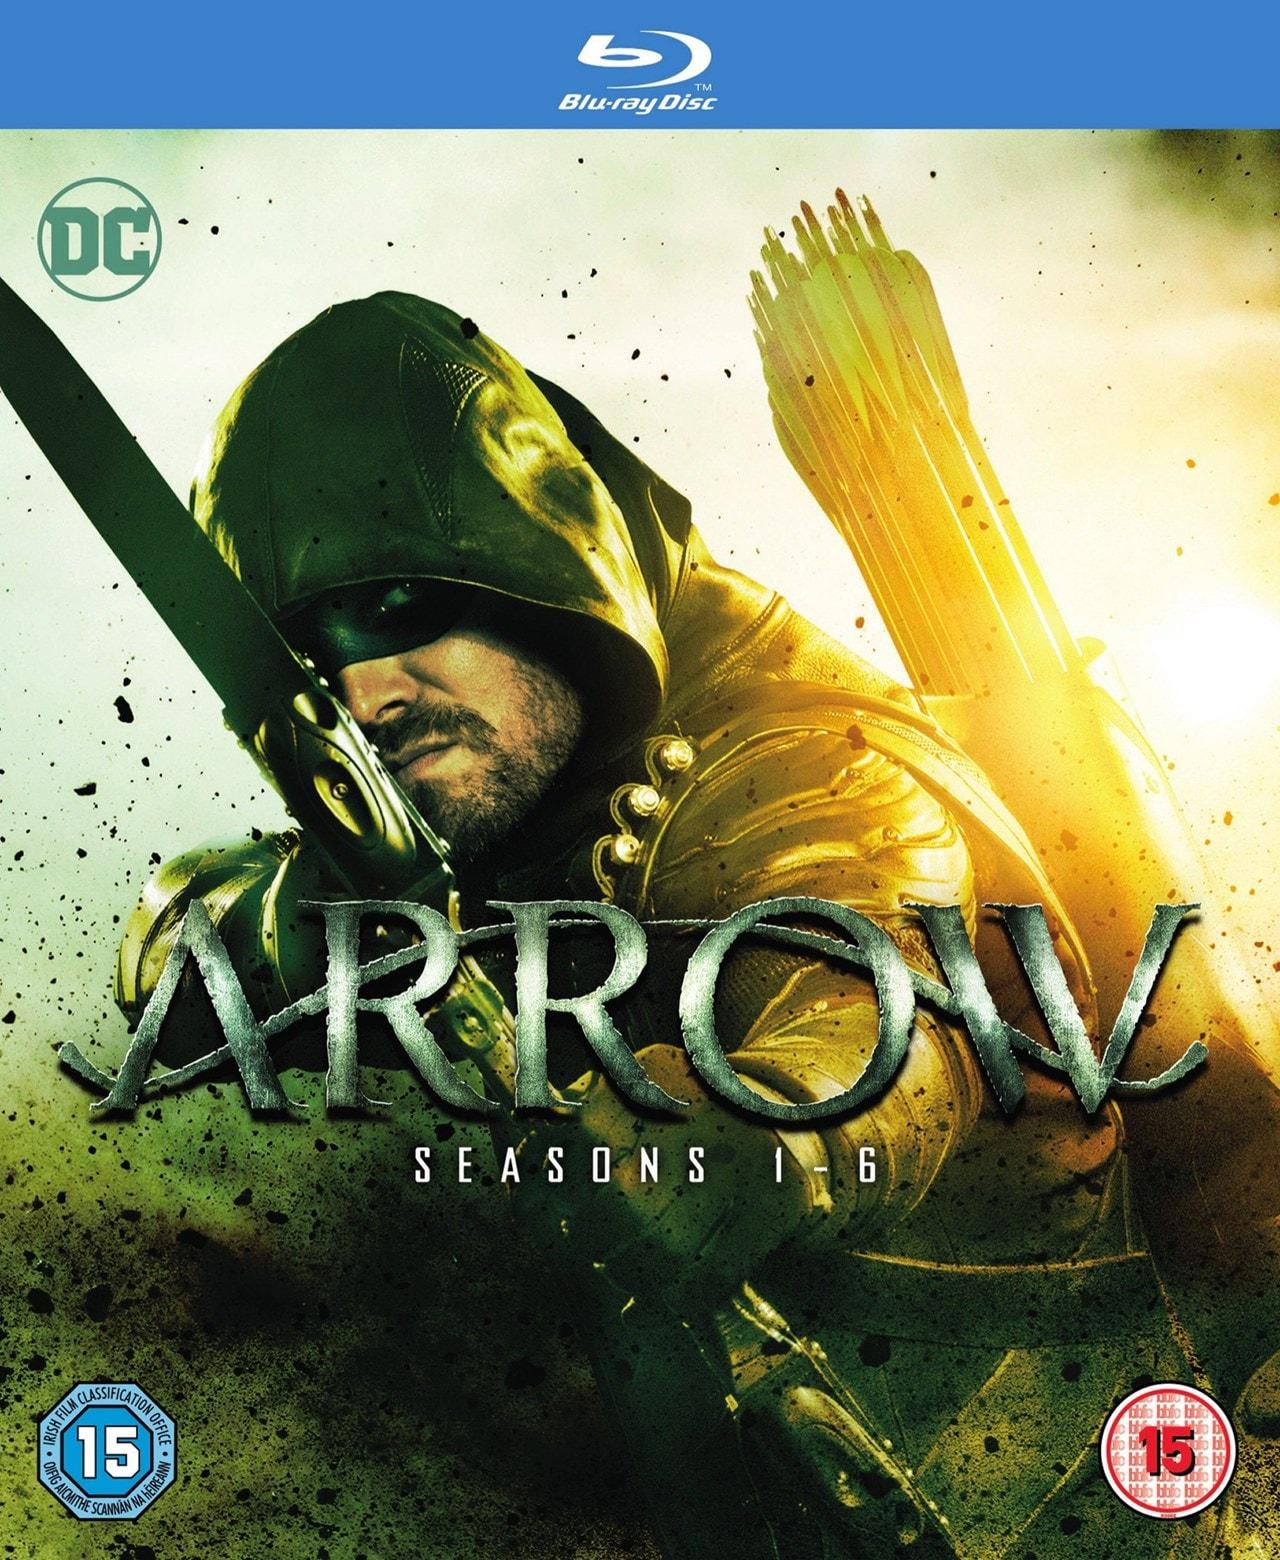 Arrow: Seasons 1-6 - 1